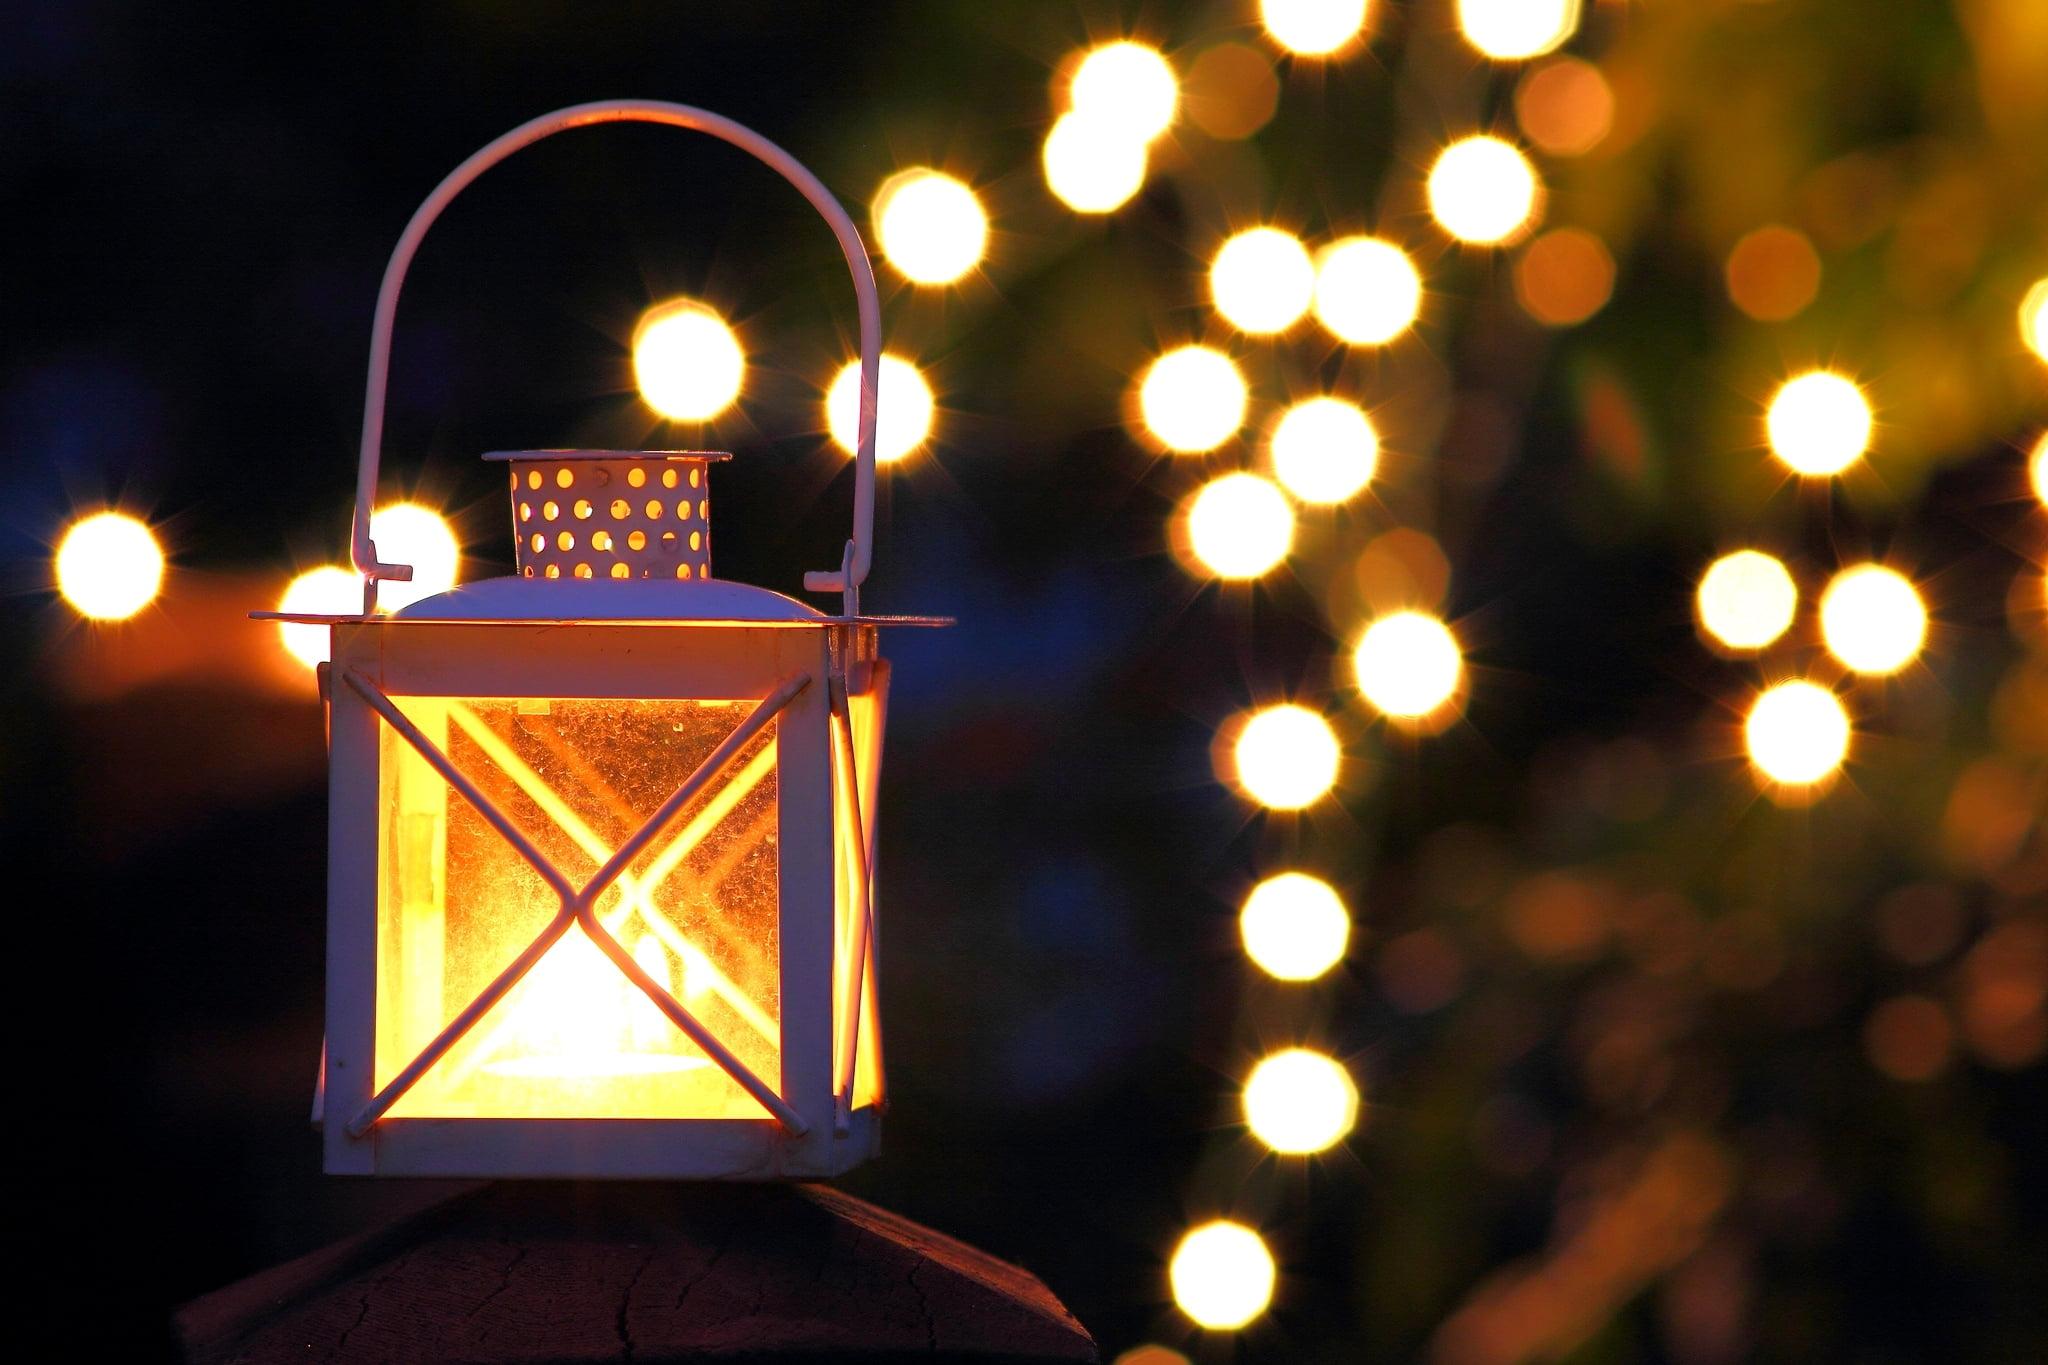 White Metal Lantern Light Night Lights The Evening Fonarik Oboi 1384790 Hd Wallpaper Backgrounds Download